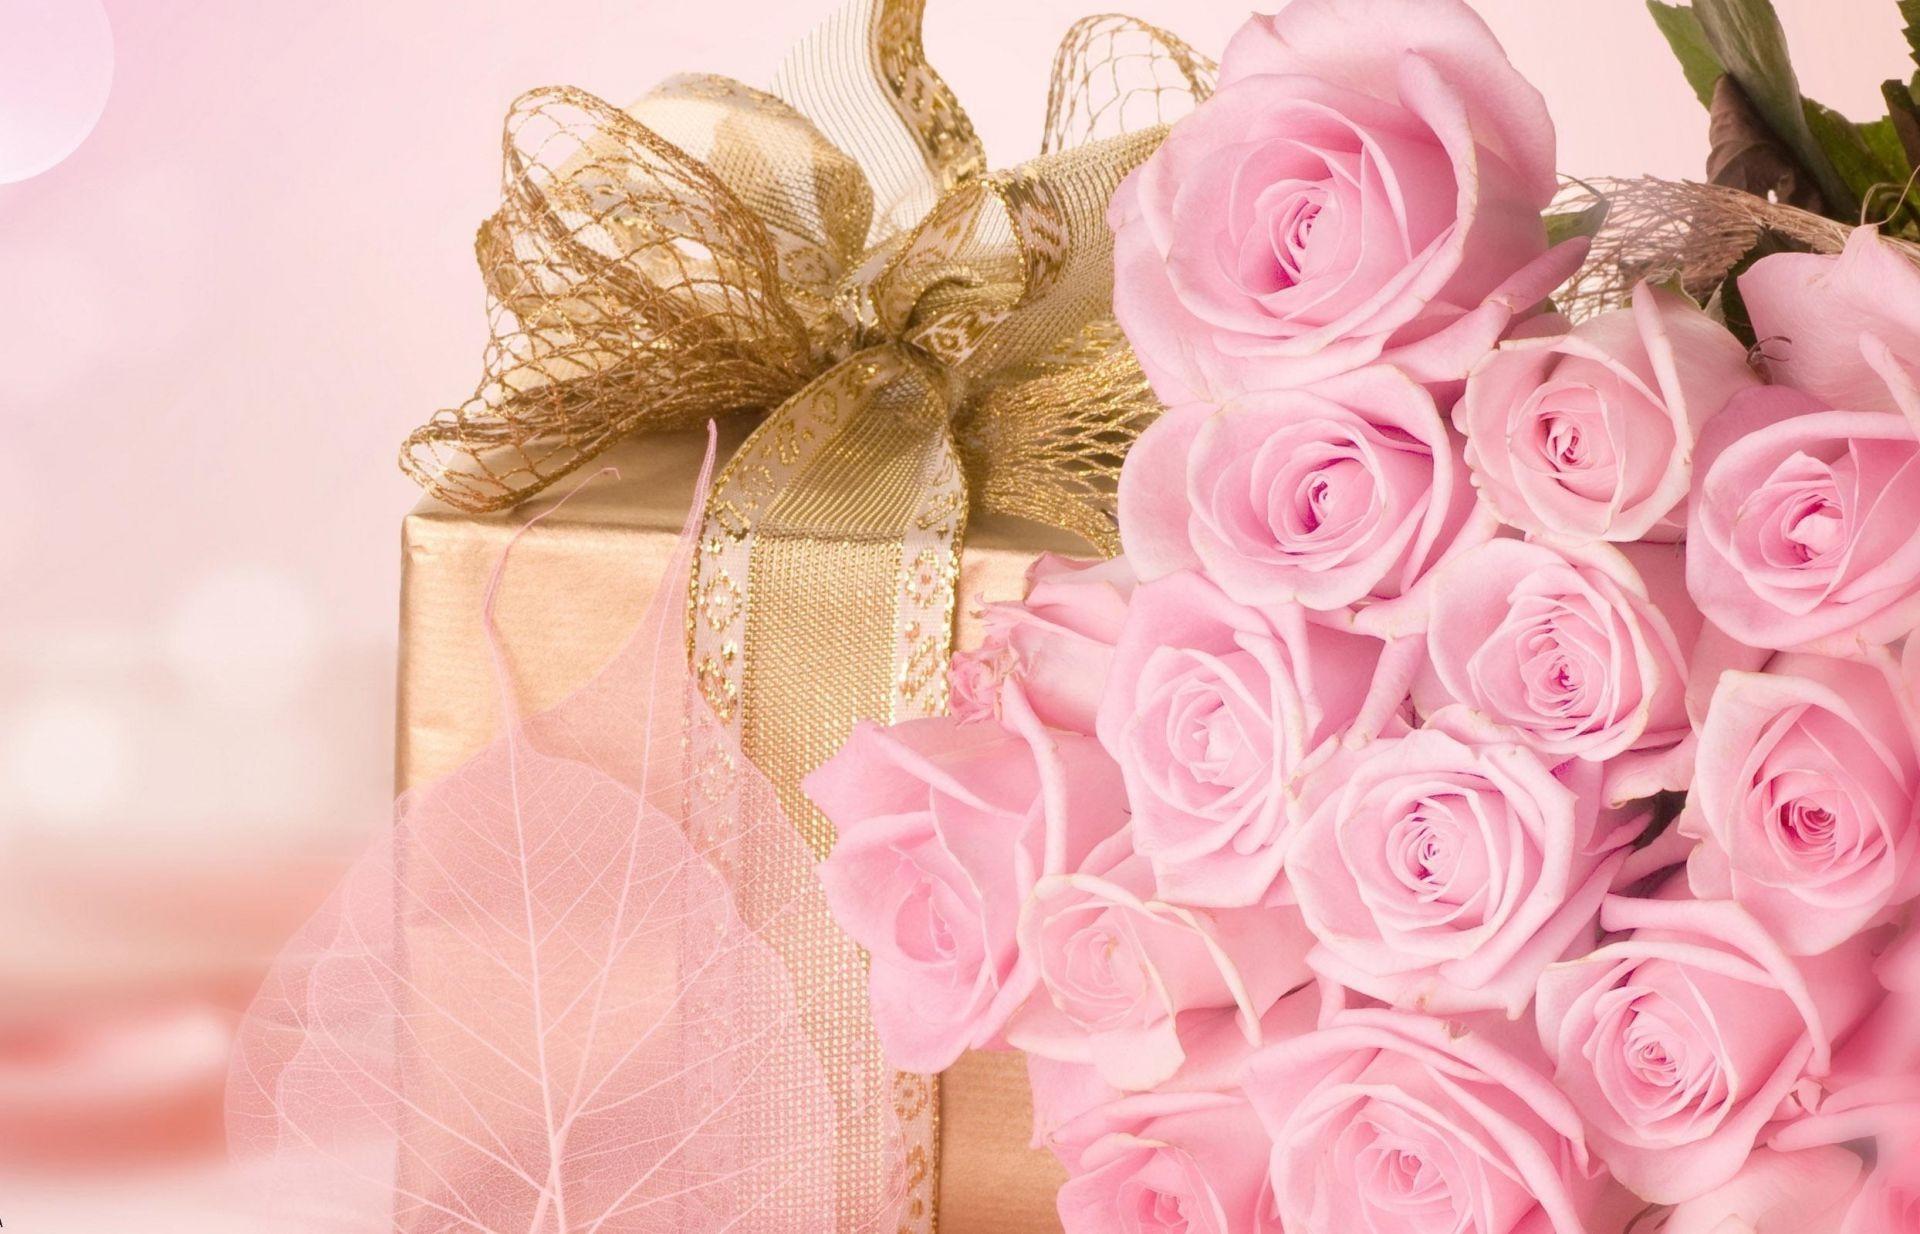 Поздравления молодым на свадьбу от тети